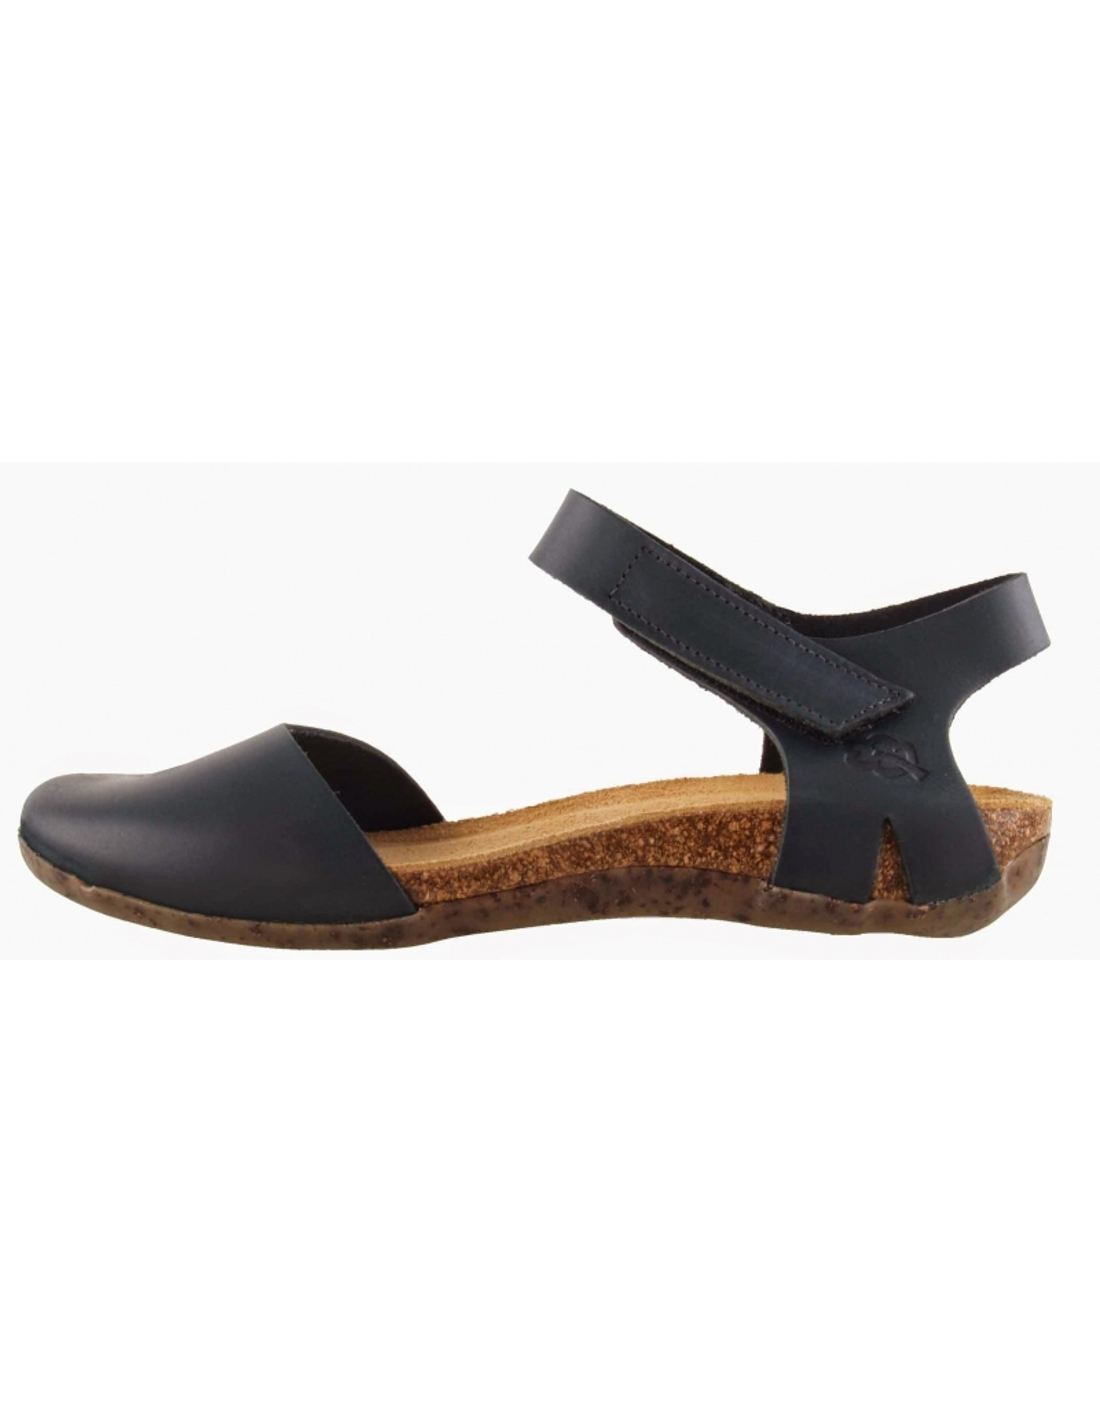 4ed1c1b91ca260 zapato mujer plano, sandalia mujer cómodos,comprar sandalias mujer ...